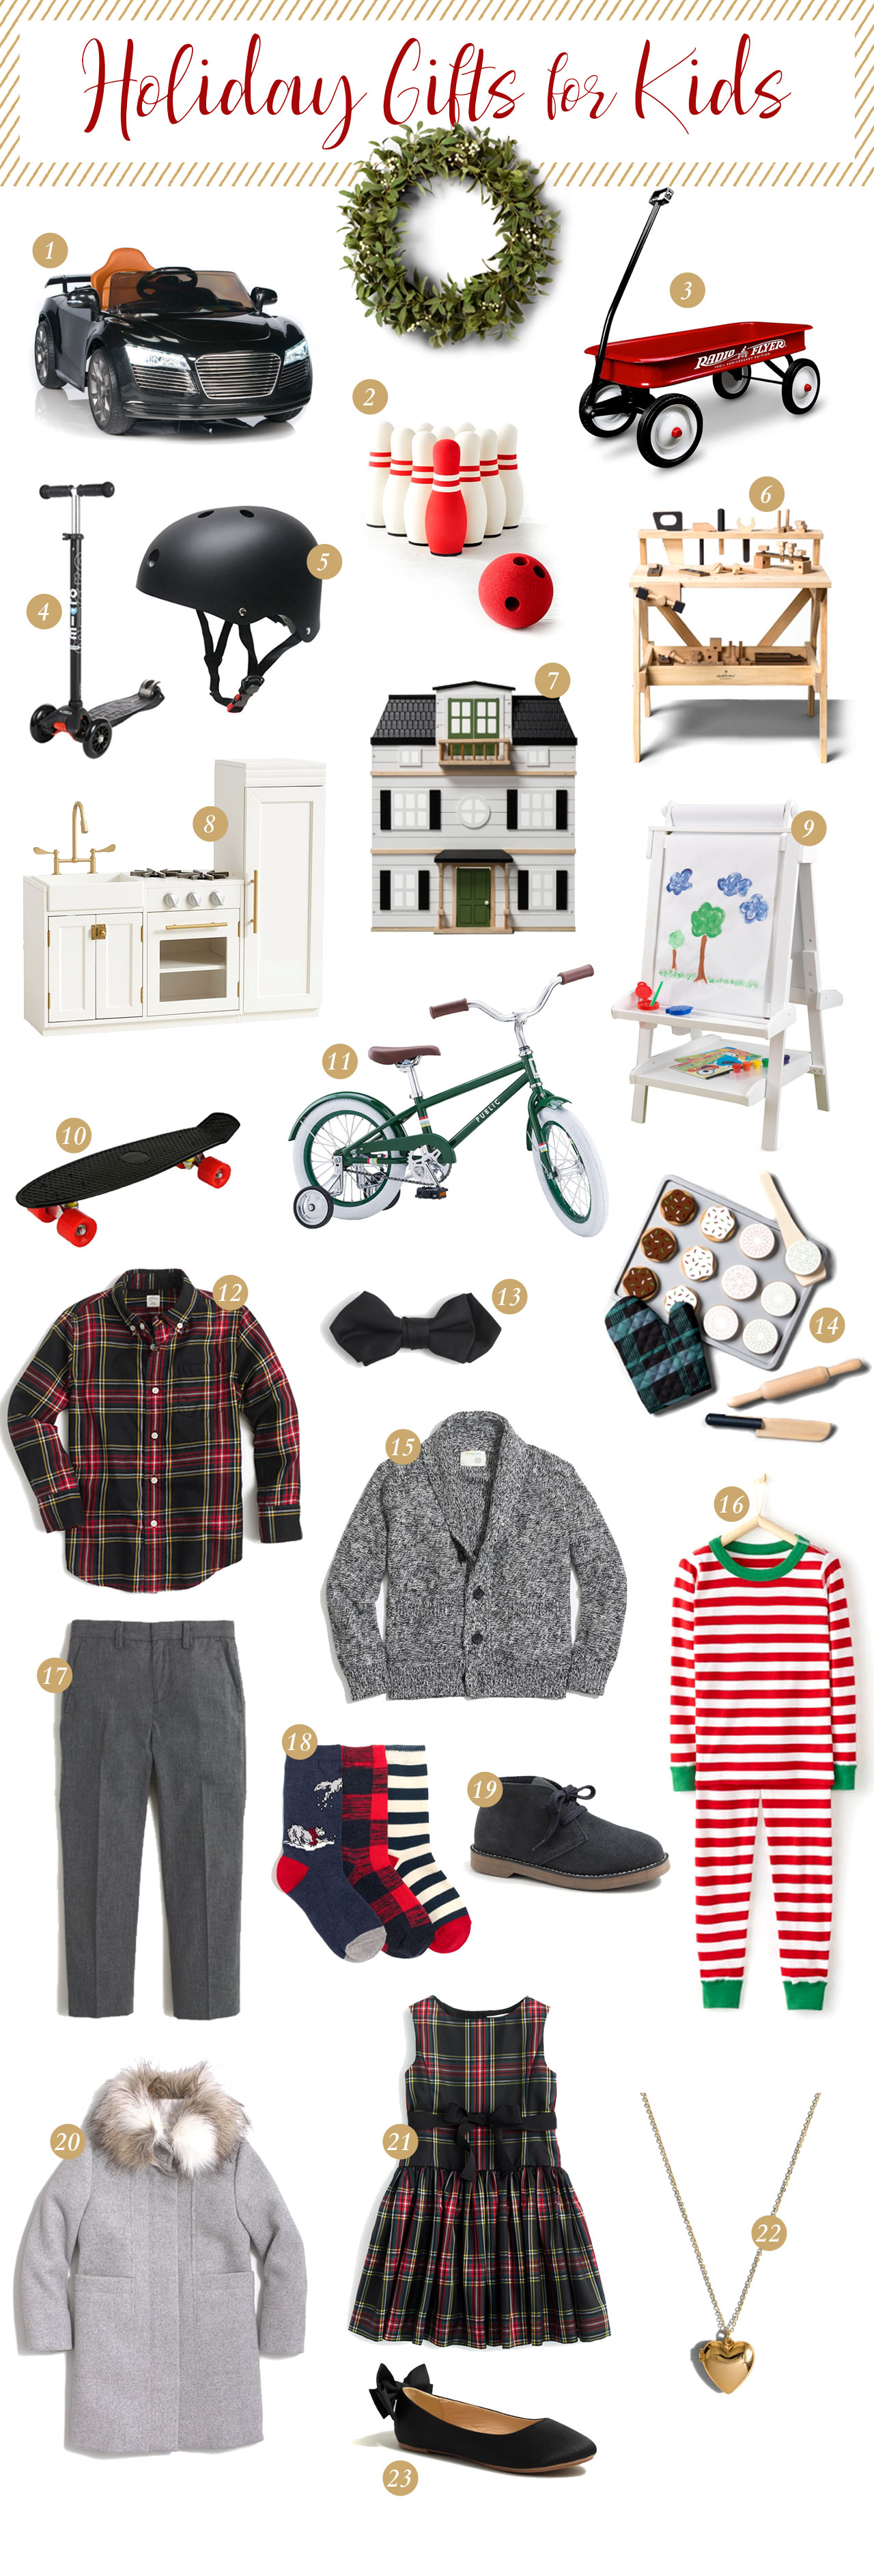 Holiday-Gift-Guide-for-Kids.jpg